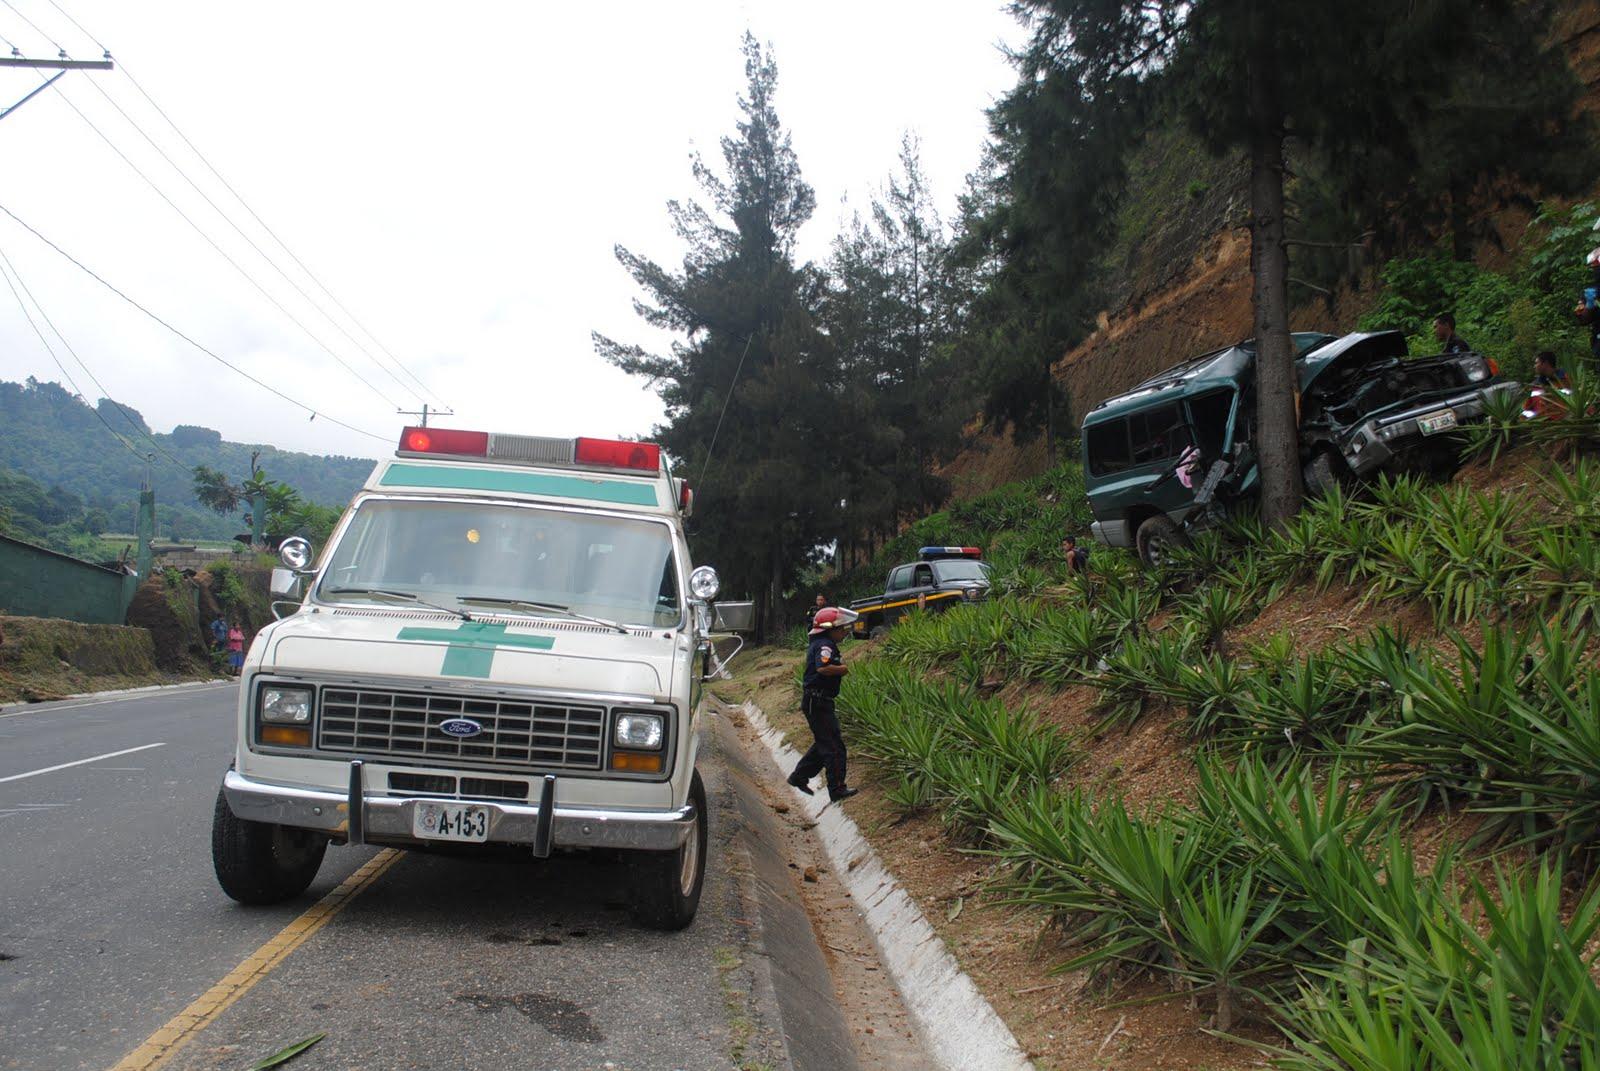 Noticias de Bomberos en Guatemala: DOS COREANOS HERIDOS EN ...